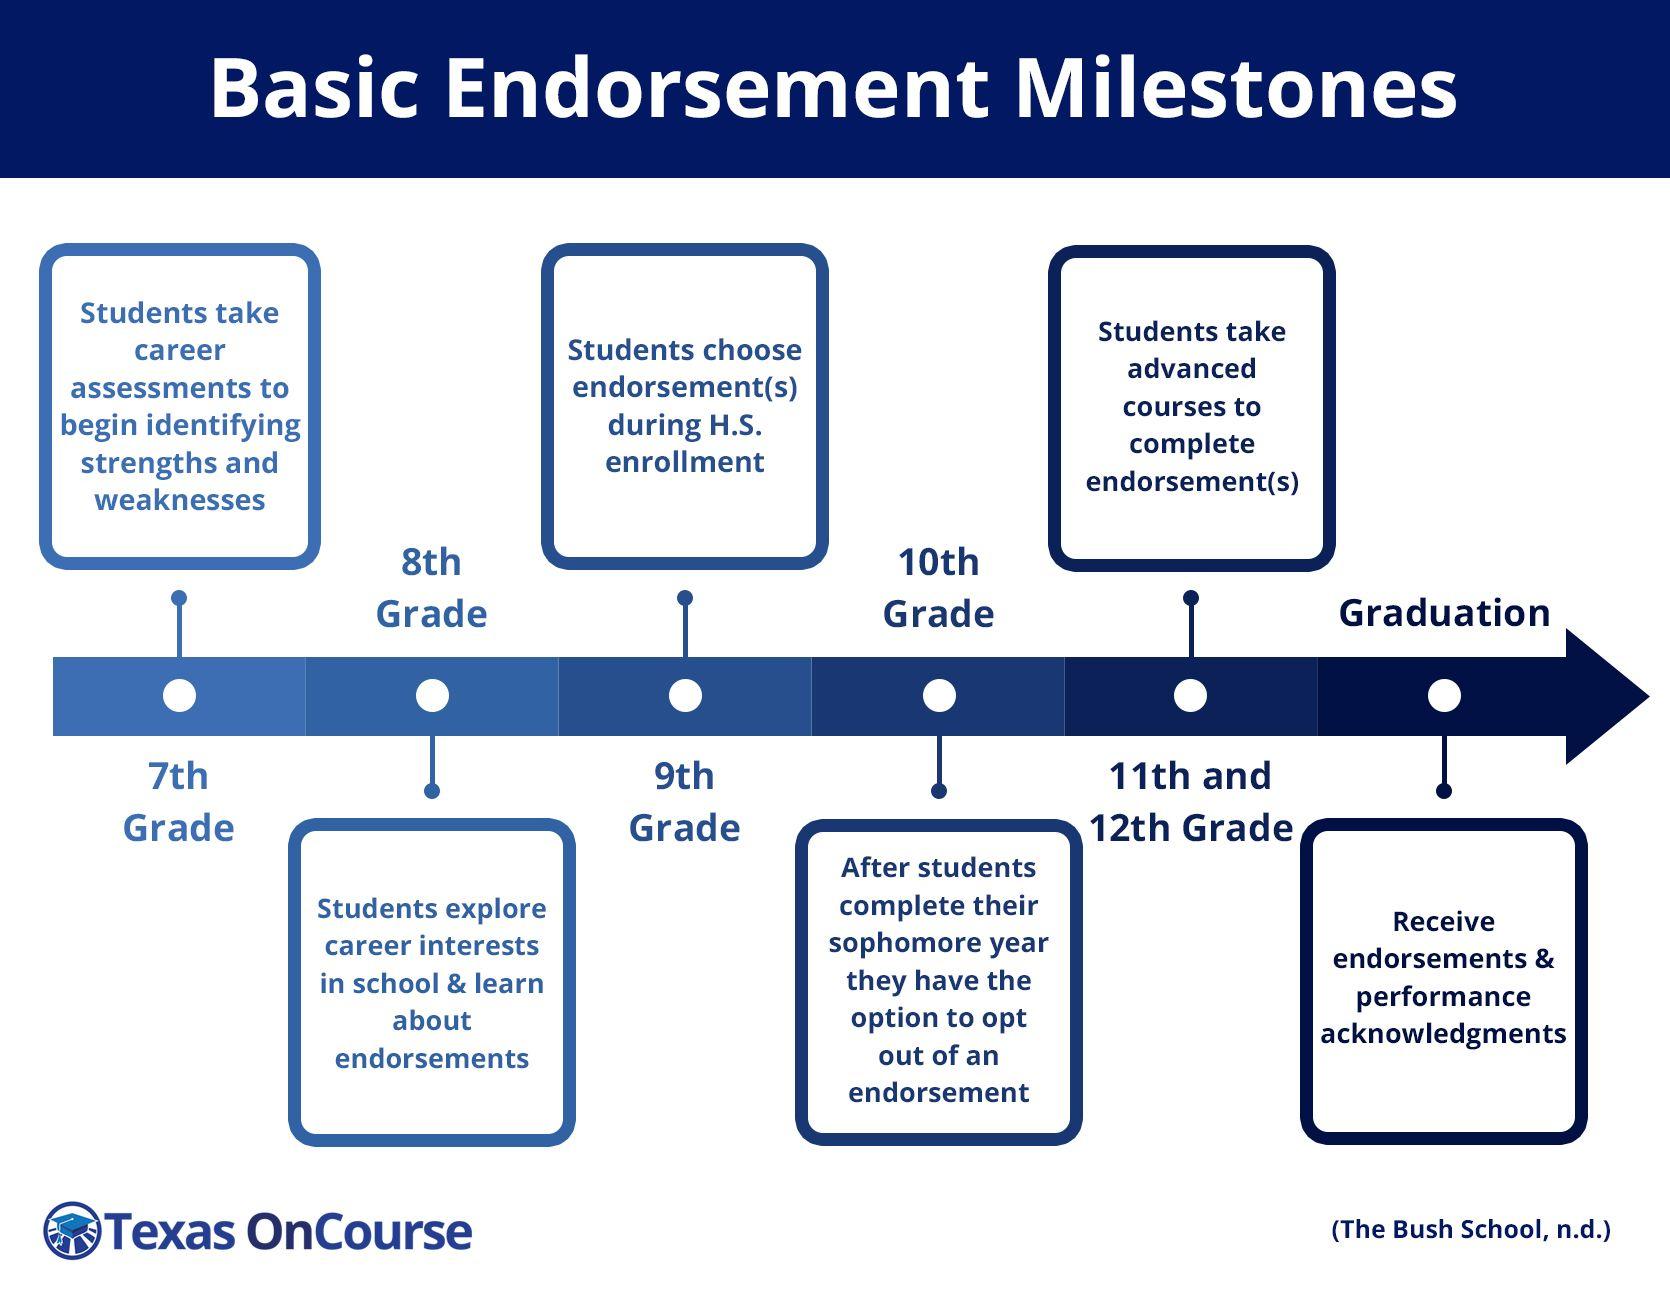 Basic Endorsement Milestones Career readiness